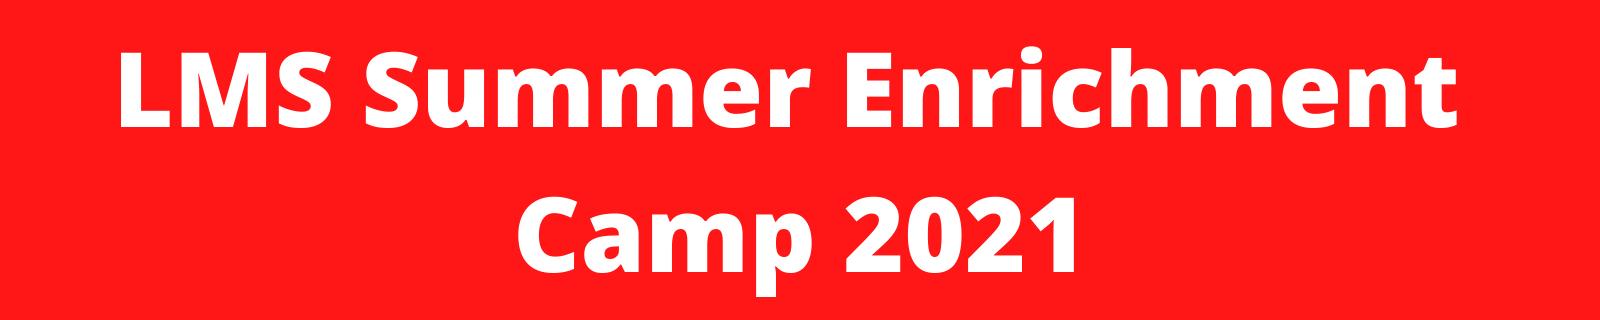 LMS Summer Enrichment Camp 2021 Banner